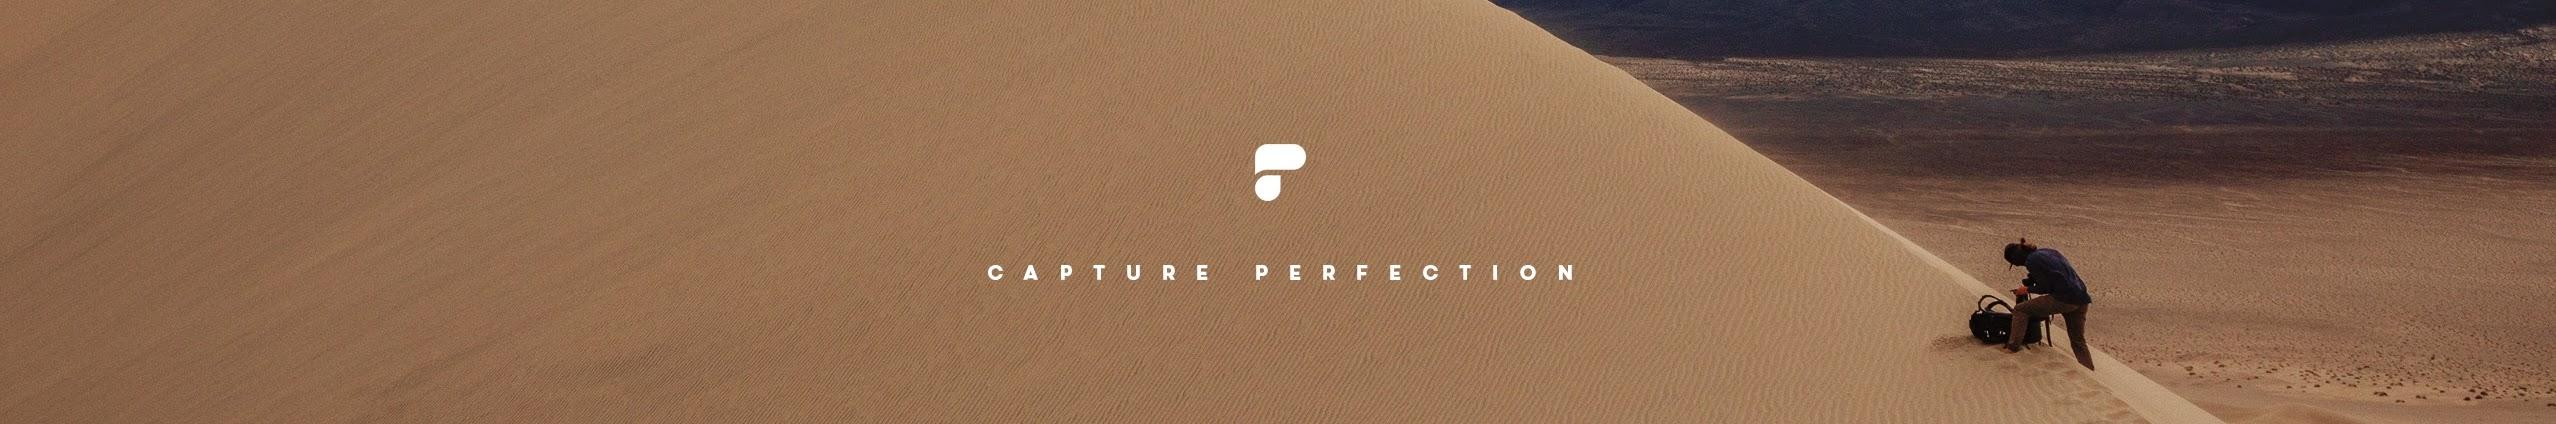 capture perfection